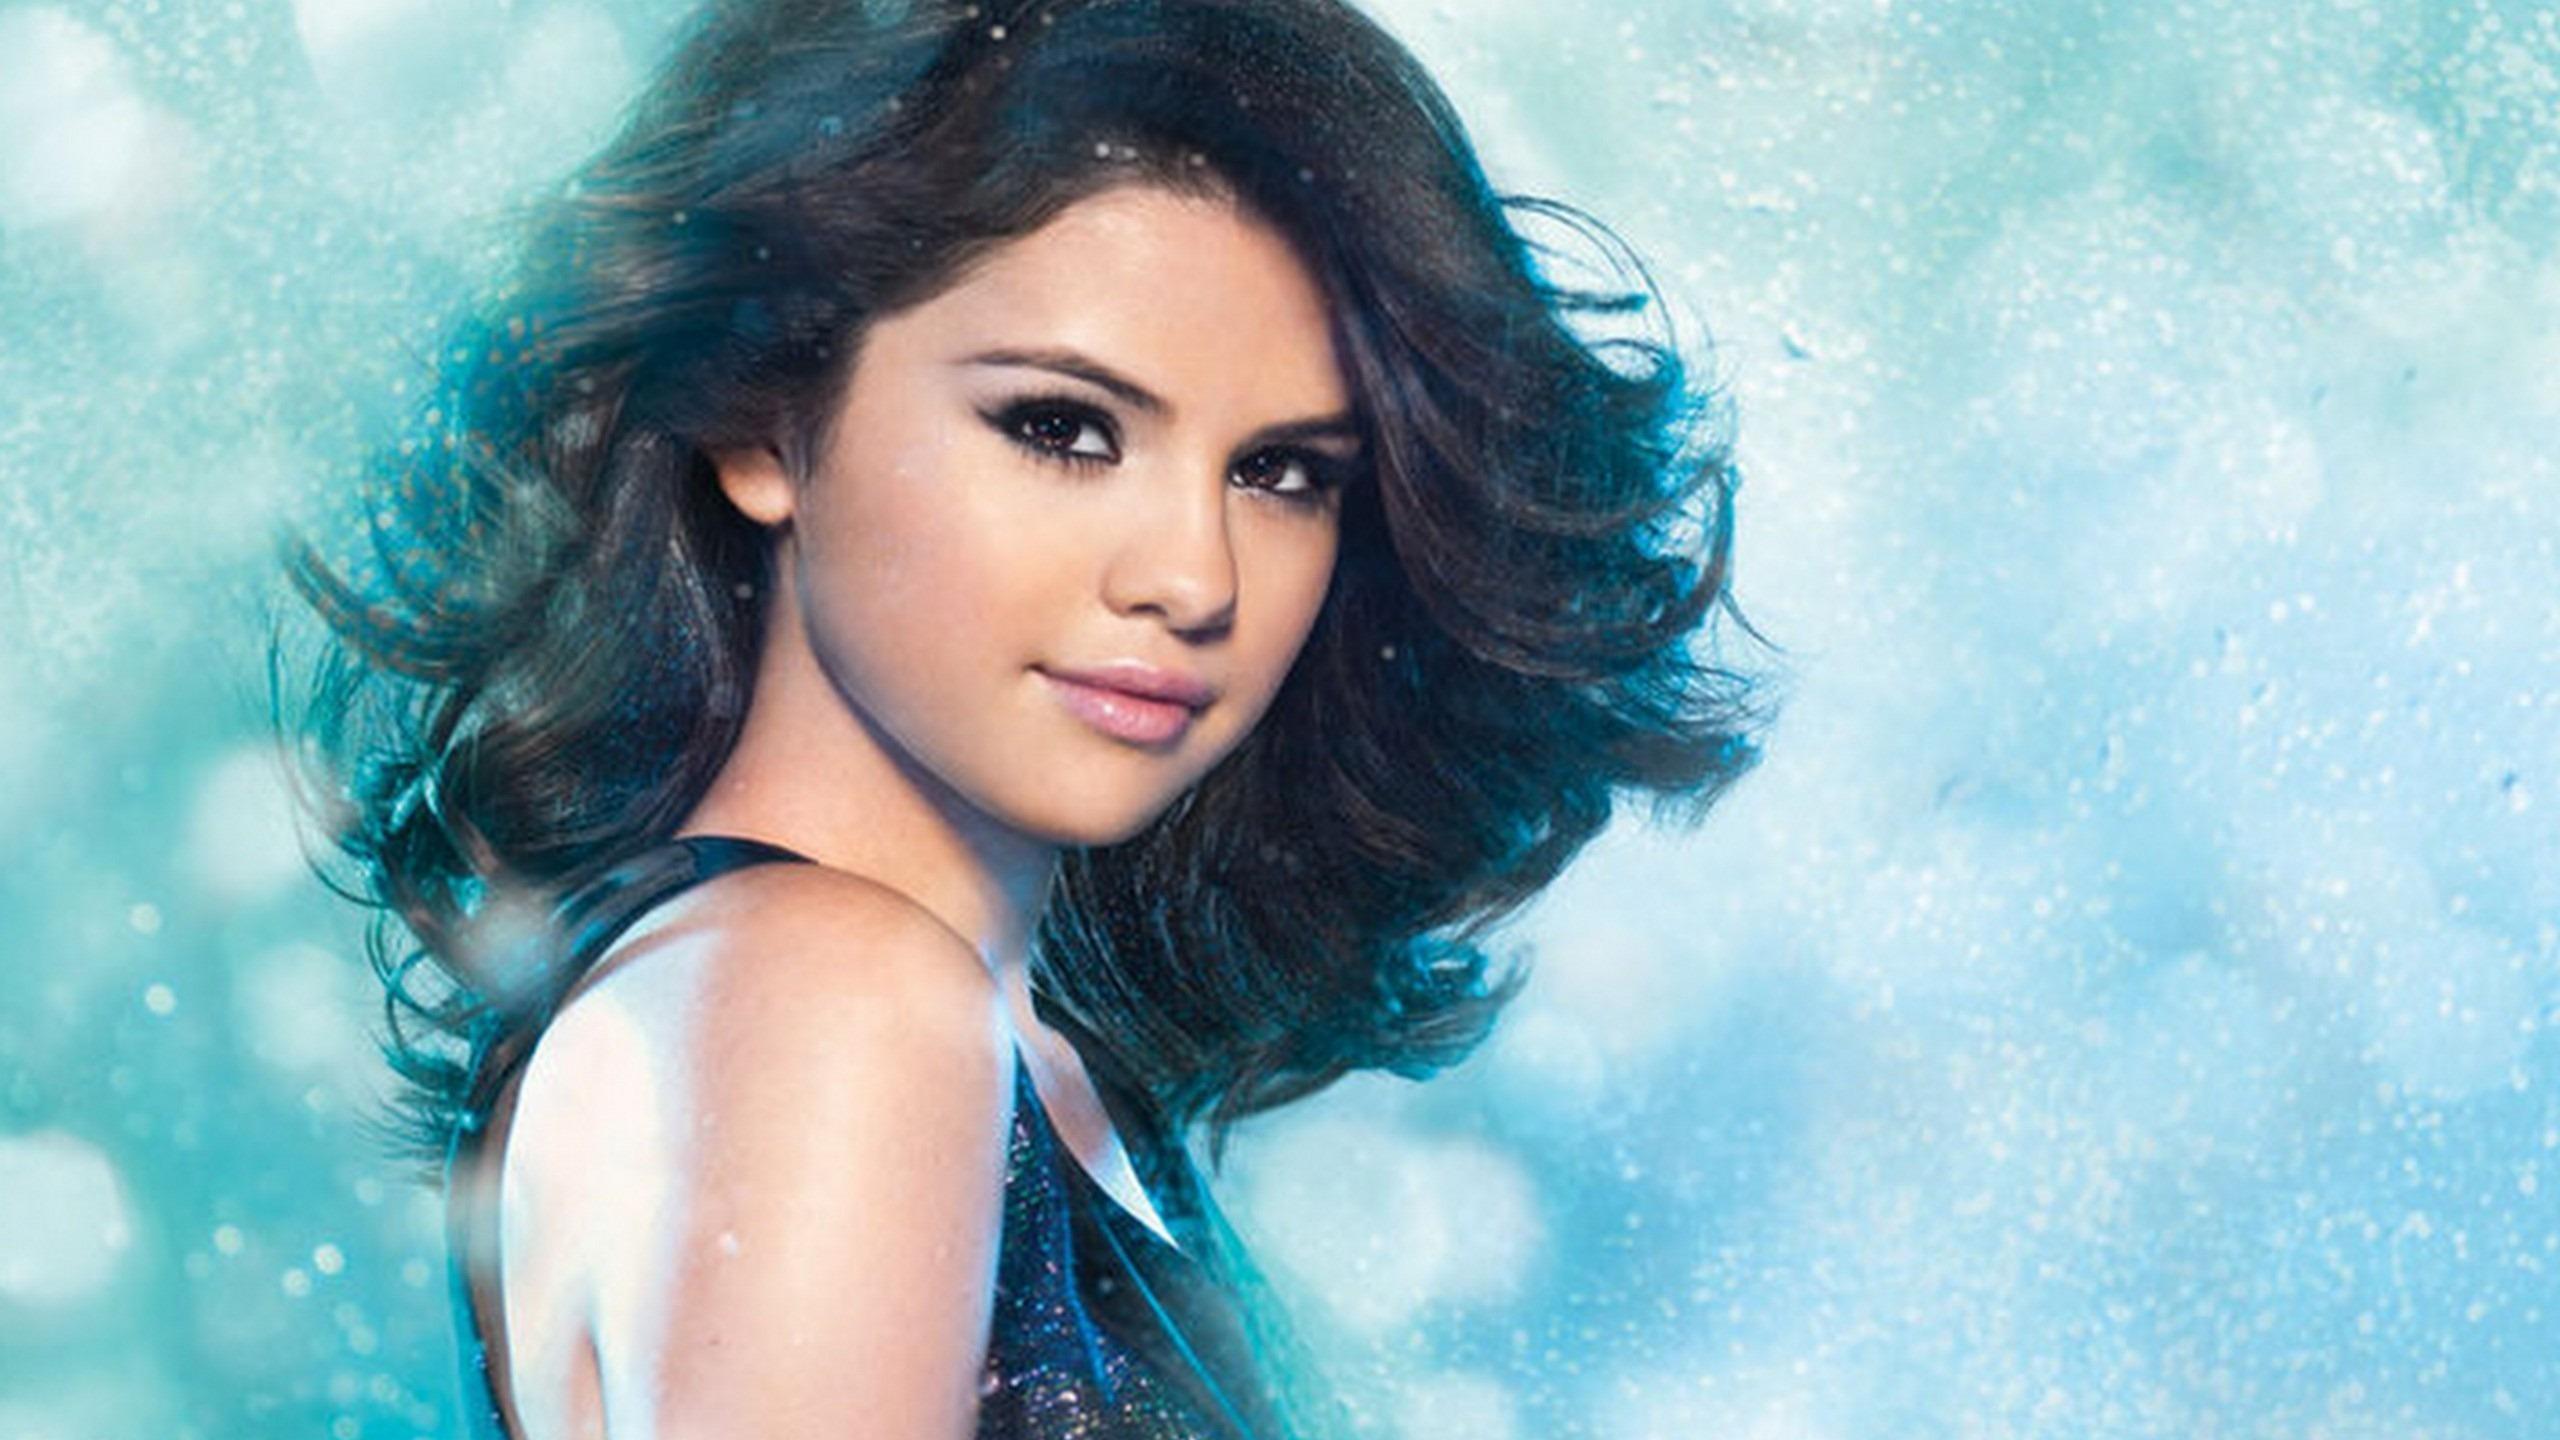 Selena Gomez Desktop Backgrounds High Quality WallpapersWallpaper 2560x1440